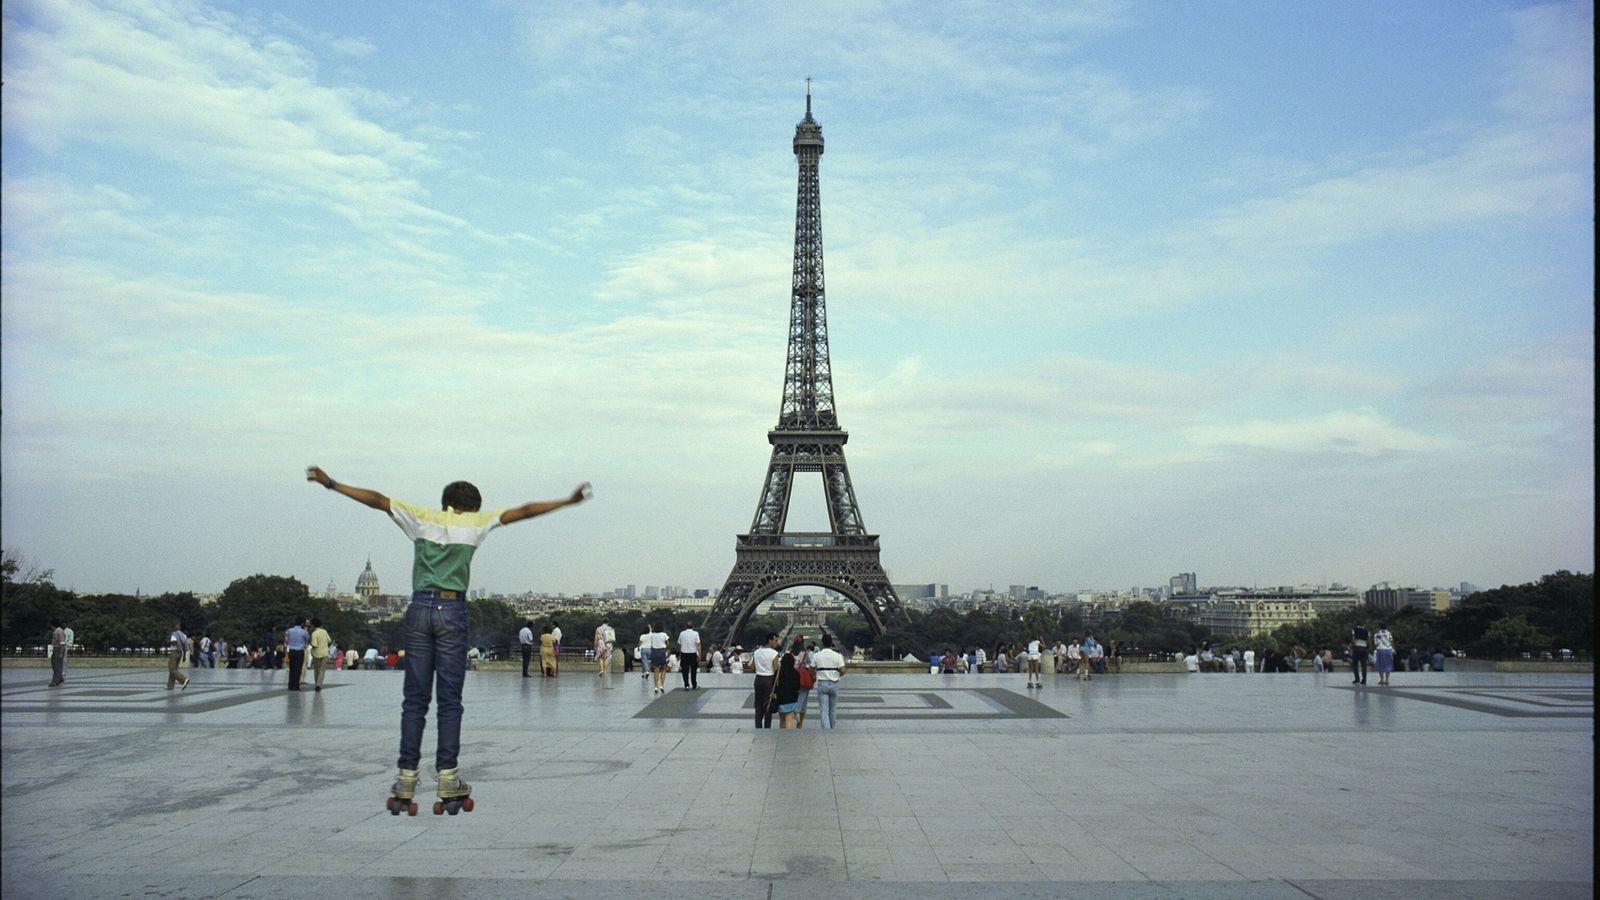 Place du Trocadero in Paris